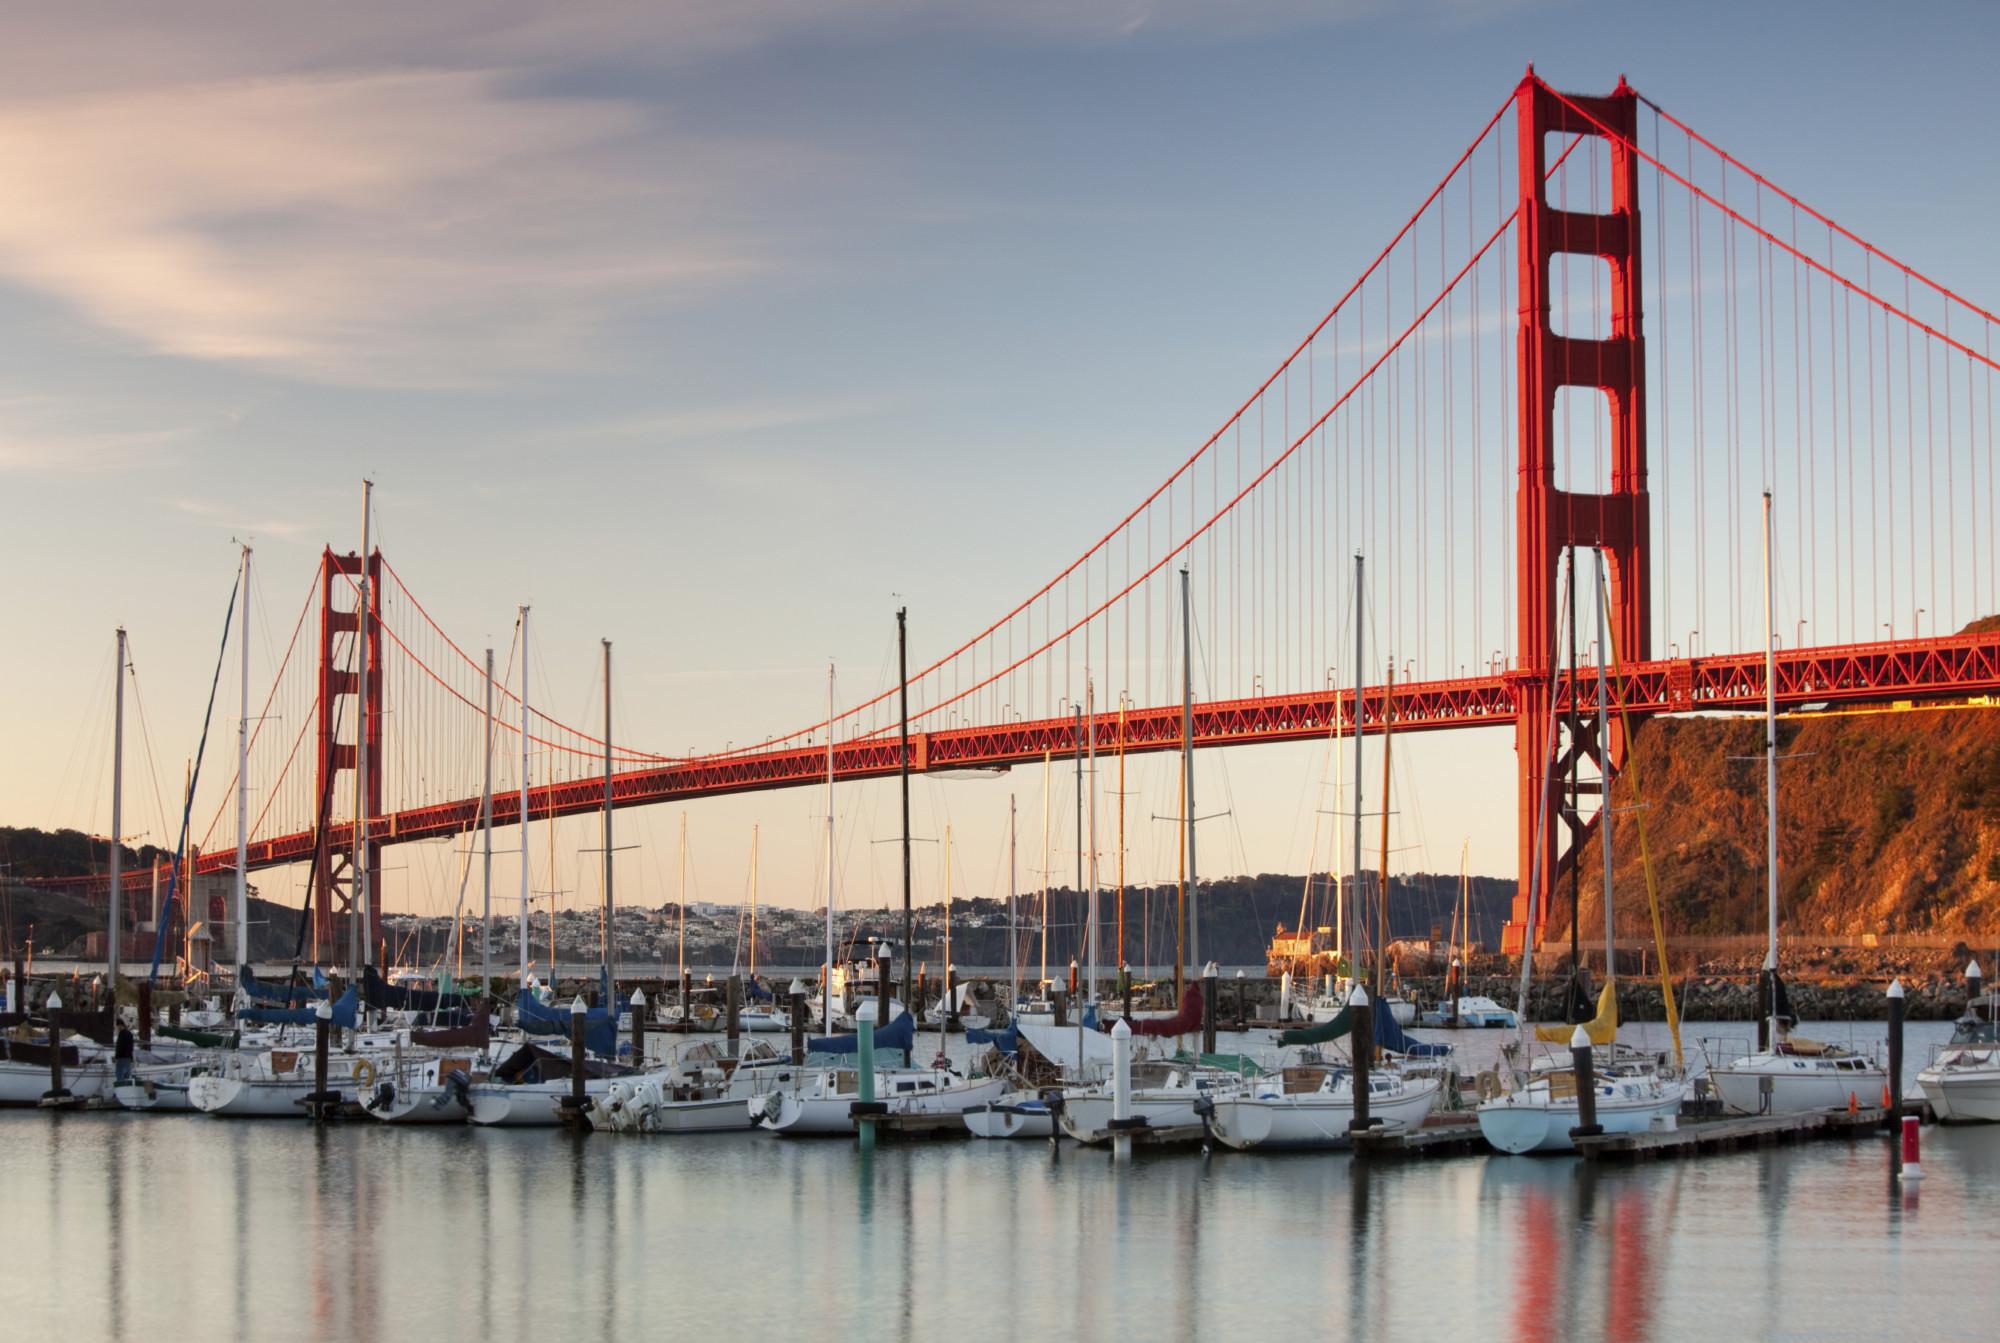 Destinations_USA_California_San-Francisco_Golden-Gate_iStock_000014941921_Large